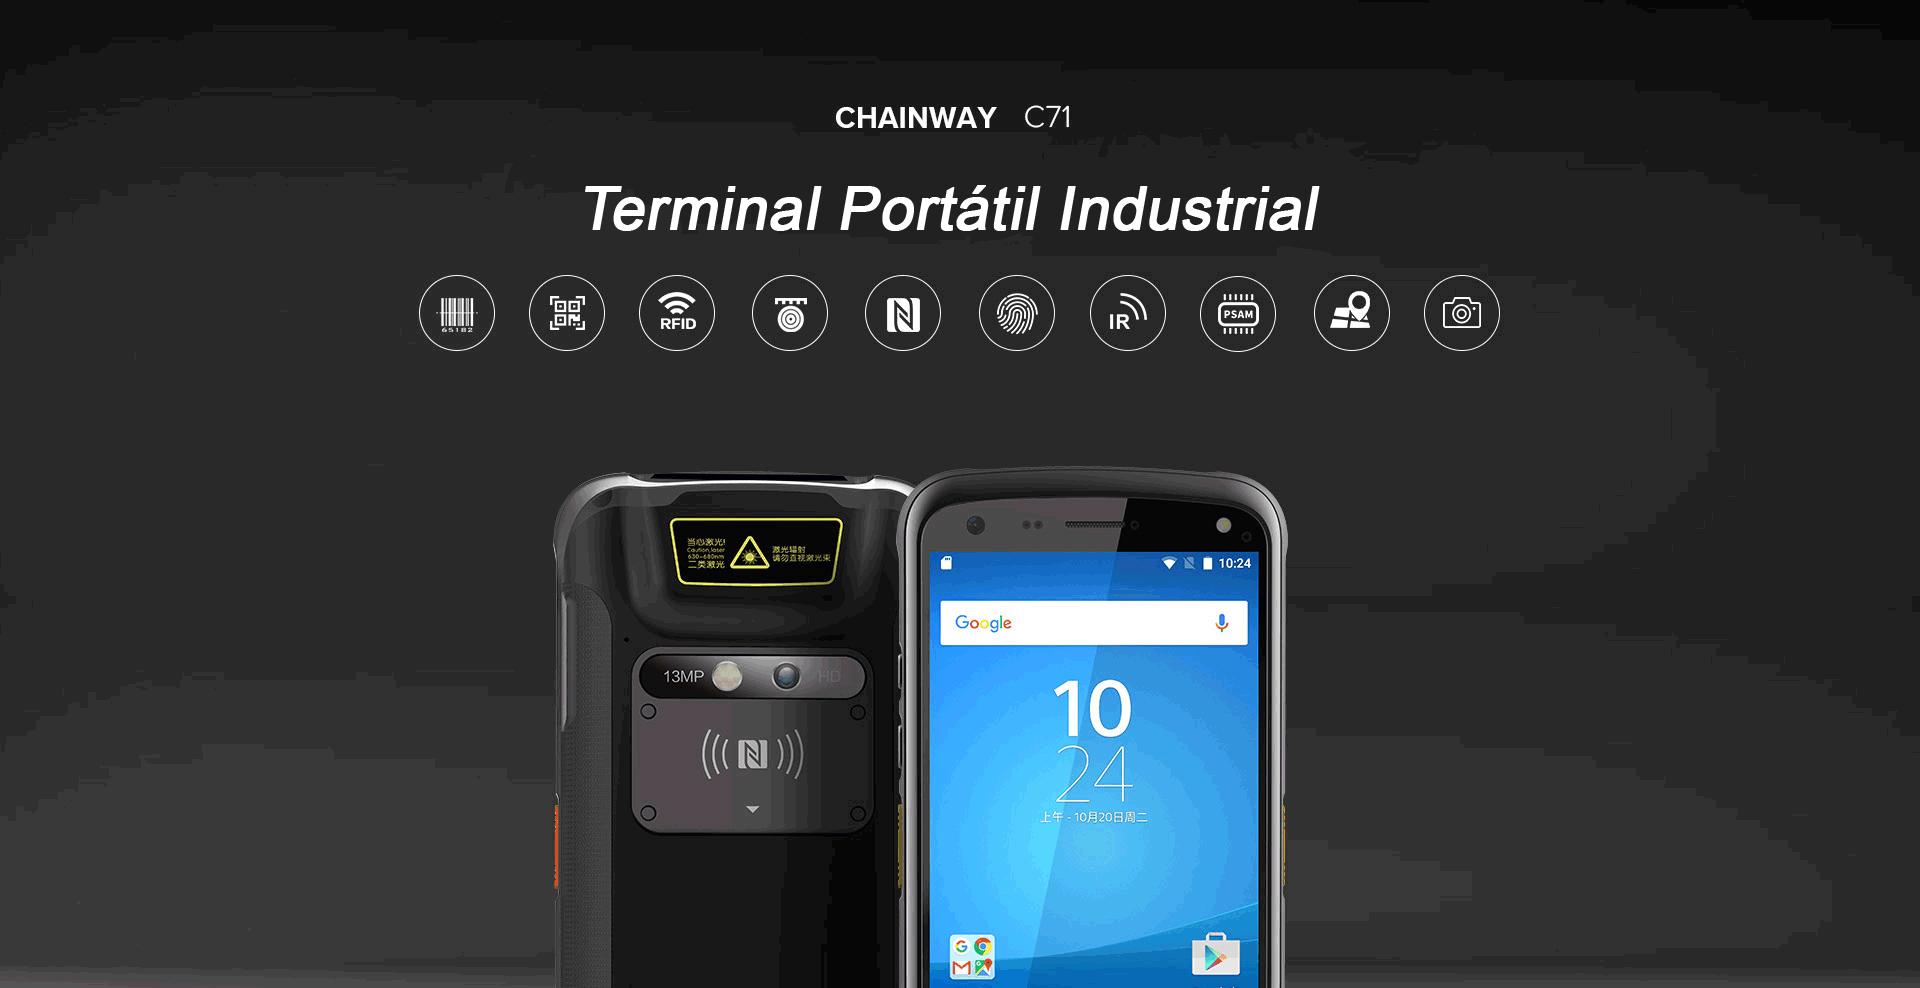 Terminal Portátil Industrial C71 Chainway